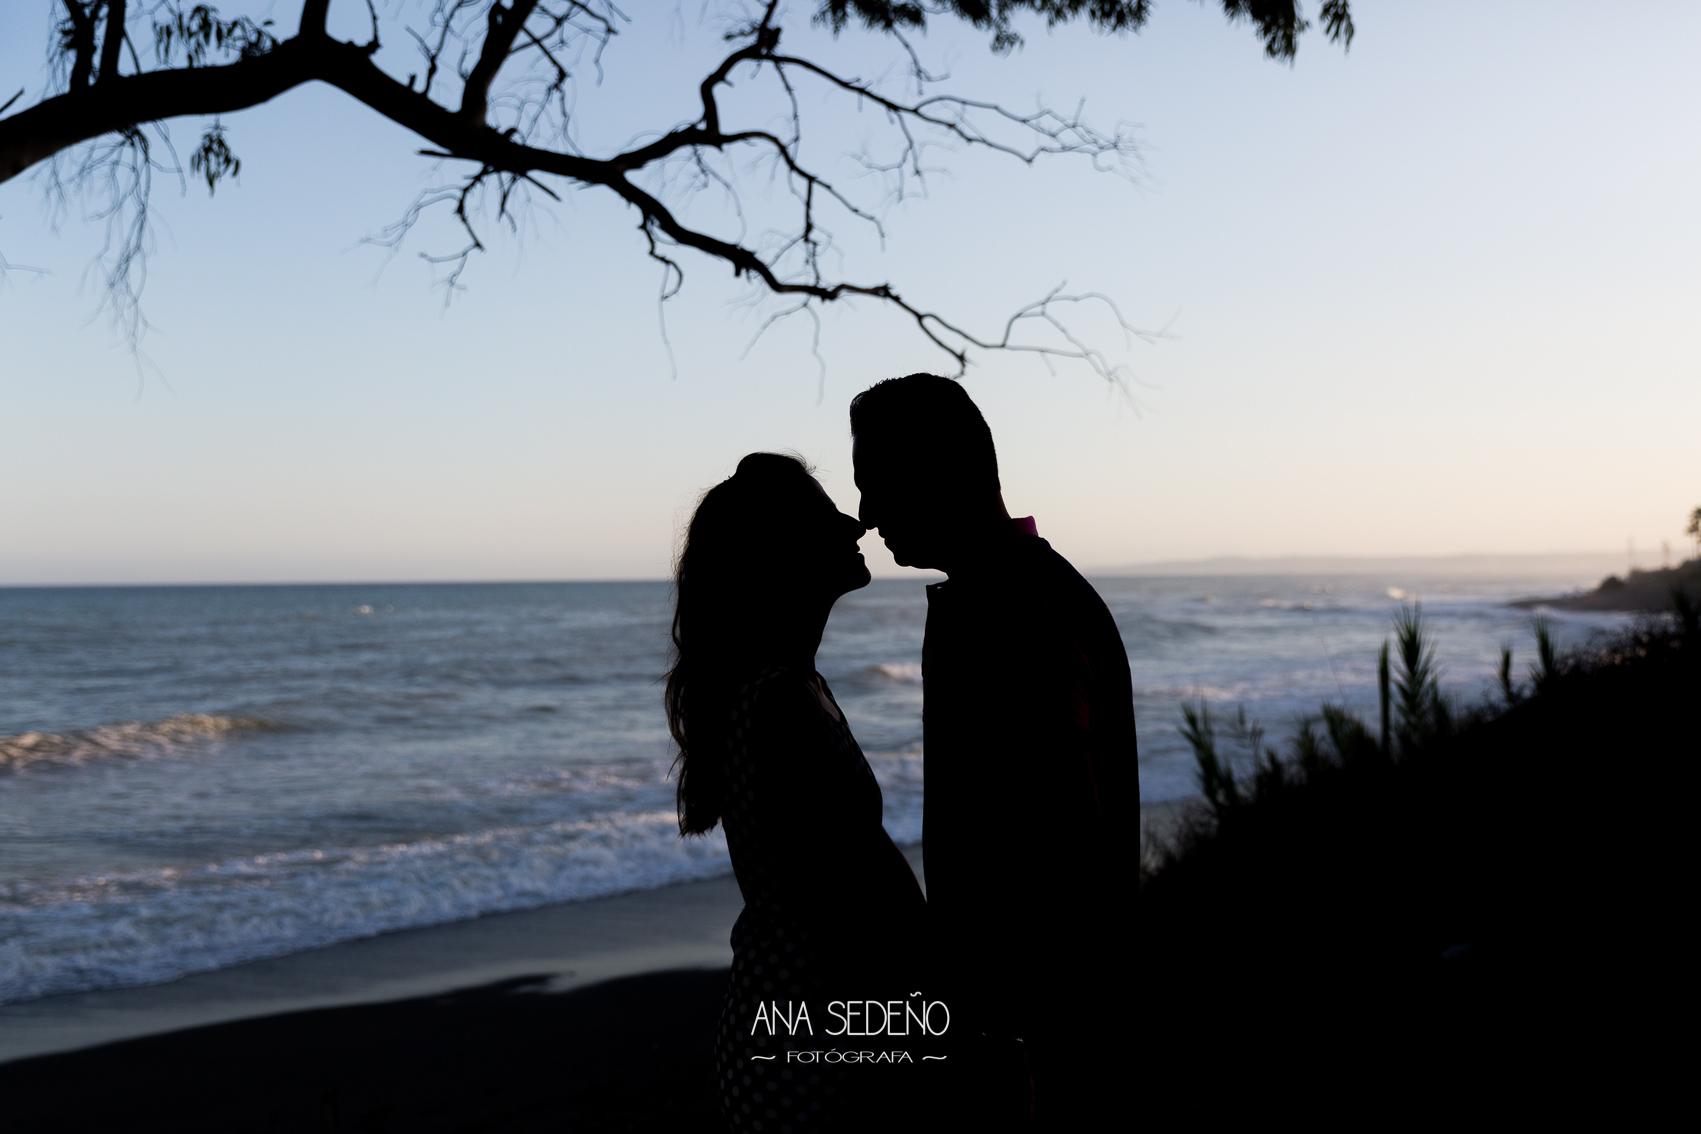 Ana Sedeño Fotografa.-PreBJ & L-0168